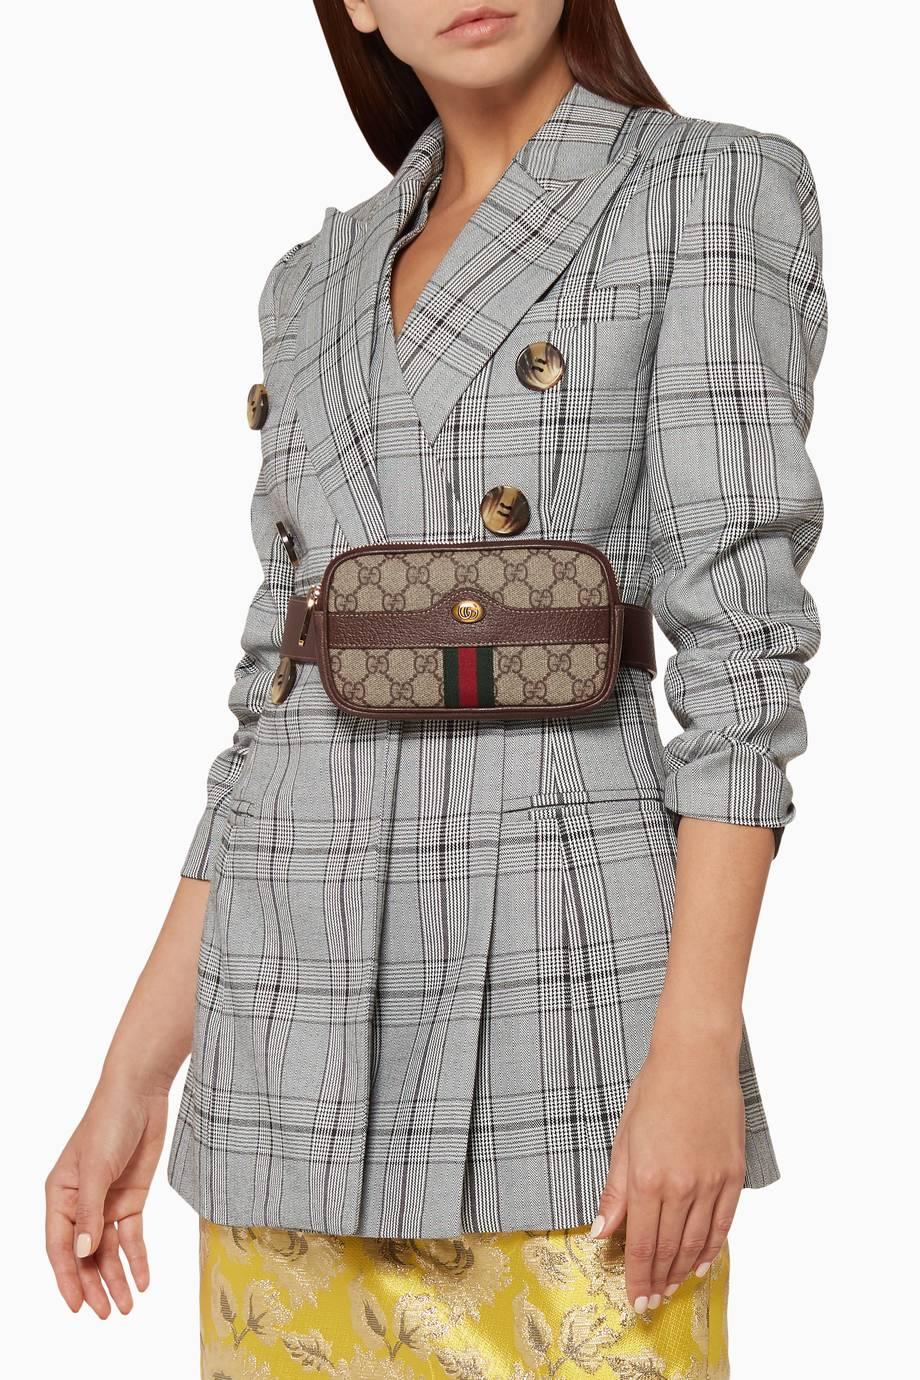 3b275b15aca Shop Luxury Gucci Beige Small Ophidia GG Supreme Belt Bag